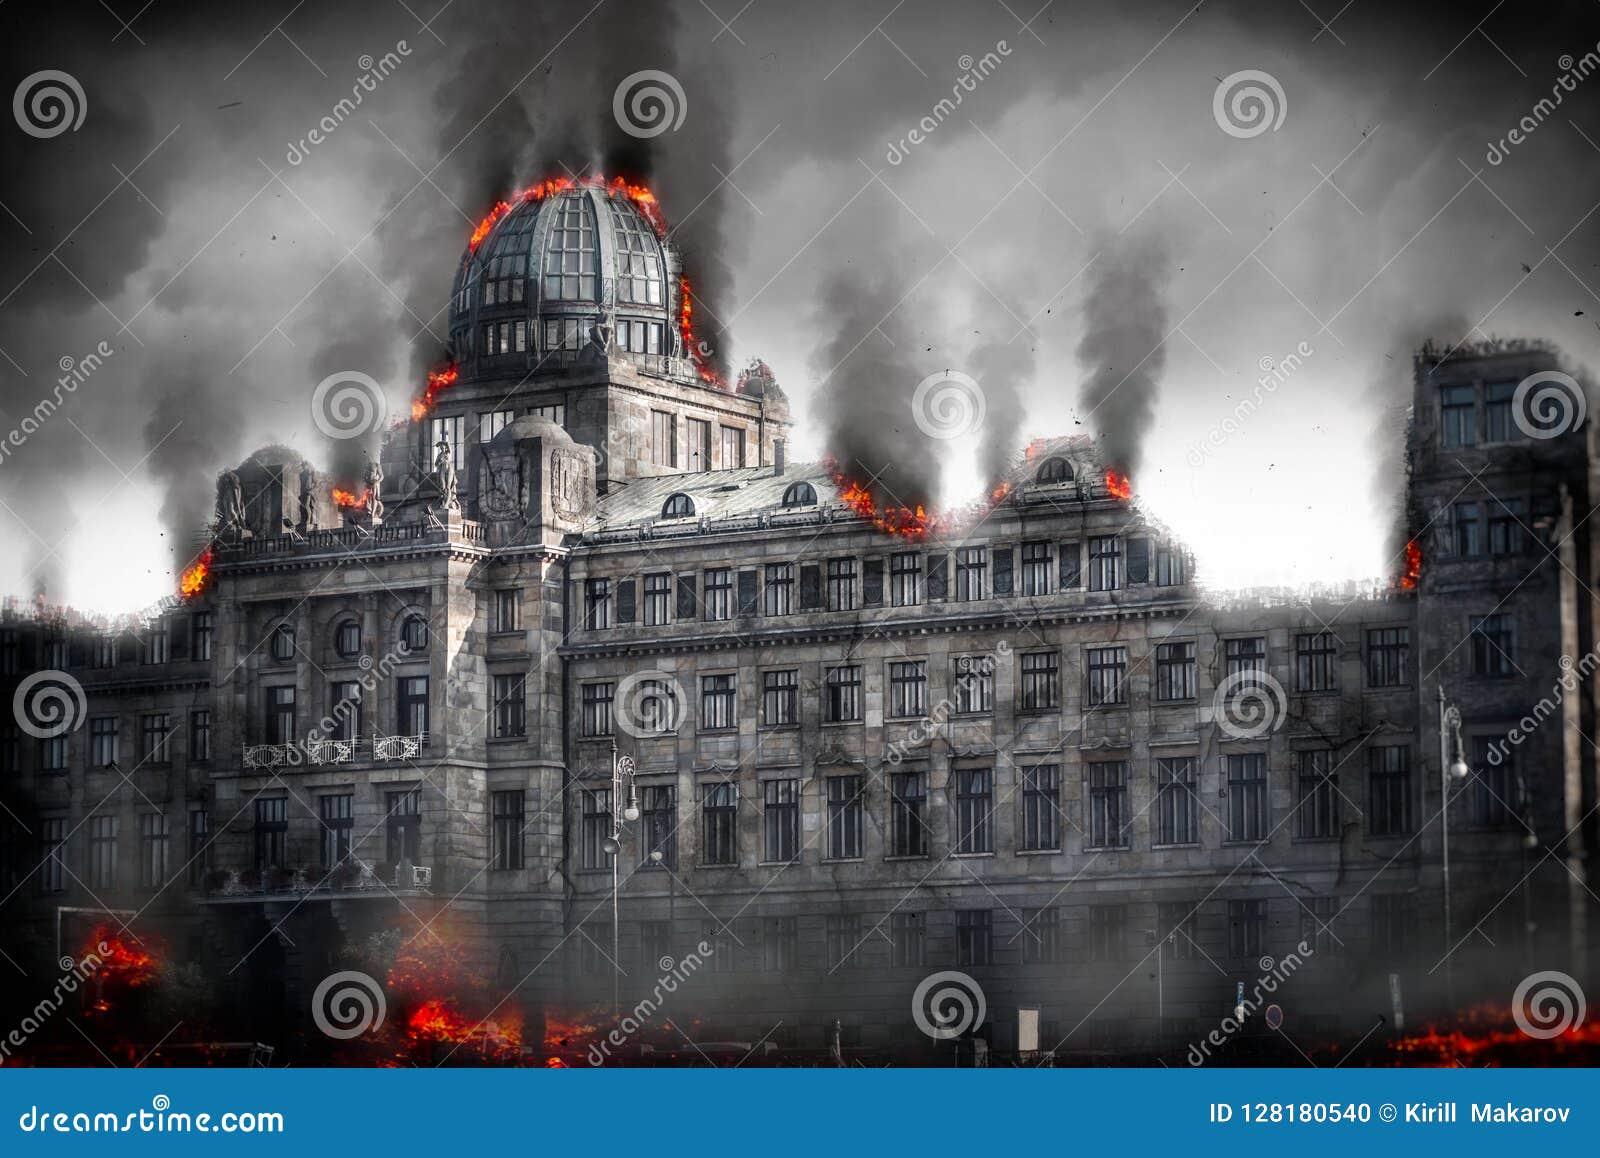 Post apocalyptic destroyed building. Digital illustration